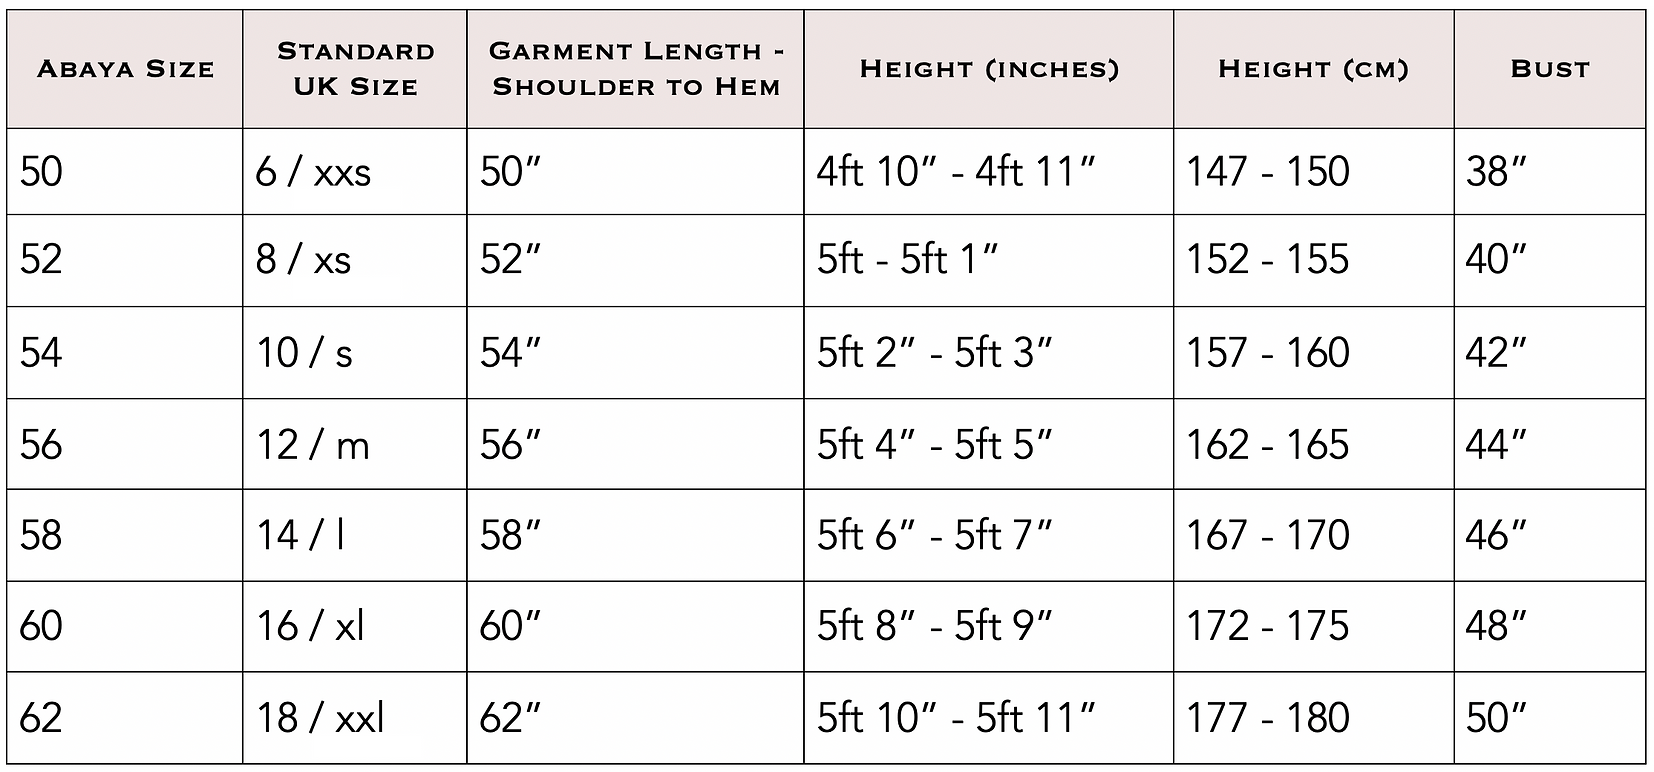 Abaya Size Guide.png